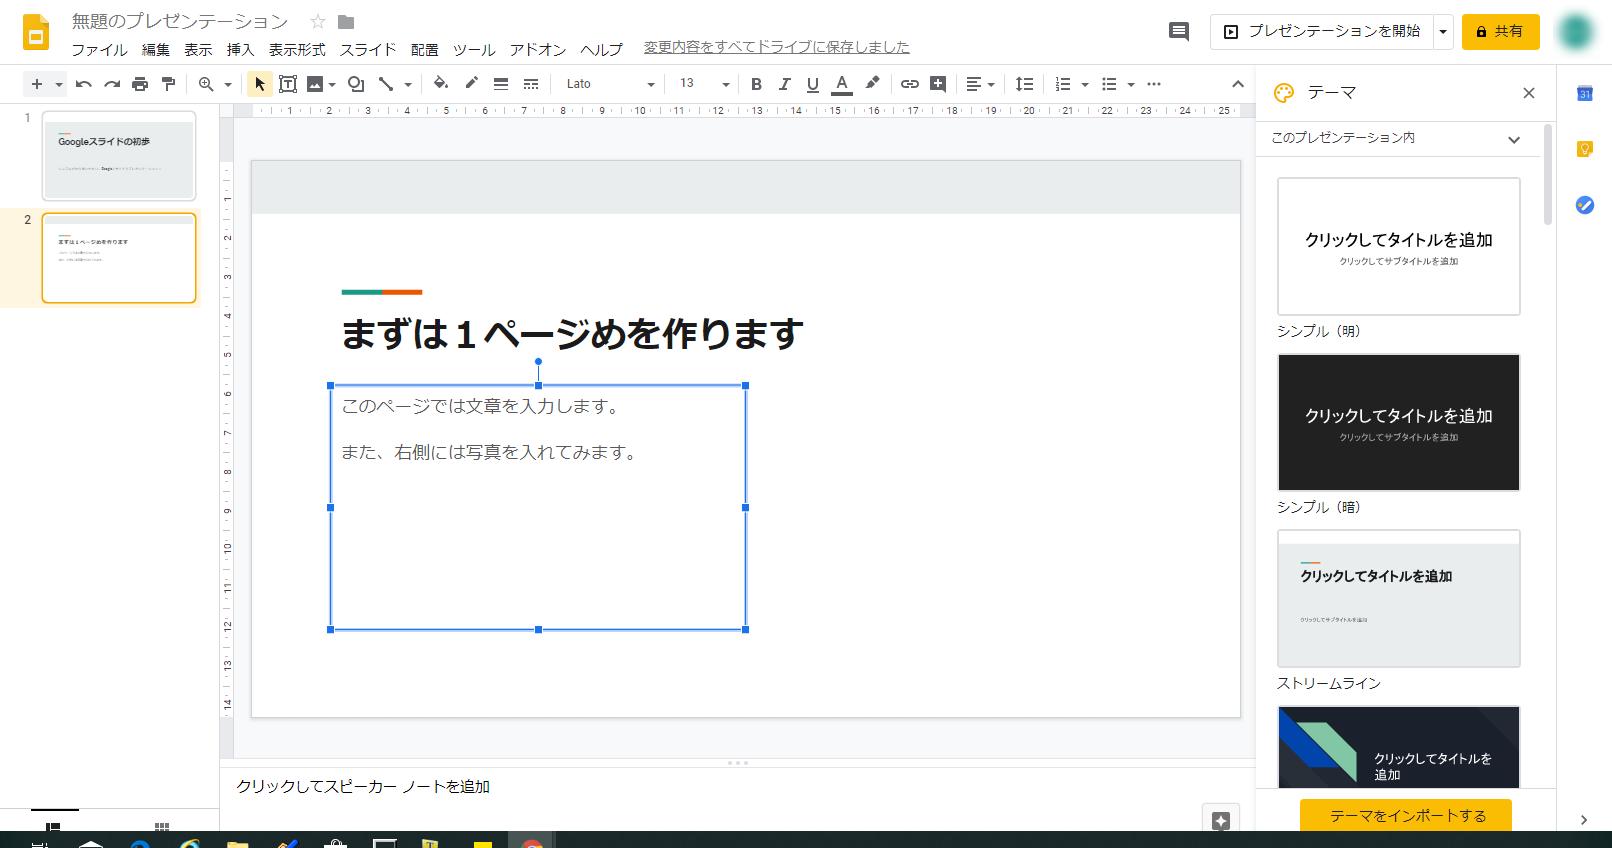 Googleスライド レイアウト枠の拡大縮小と移動